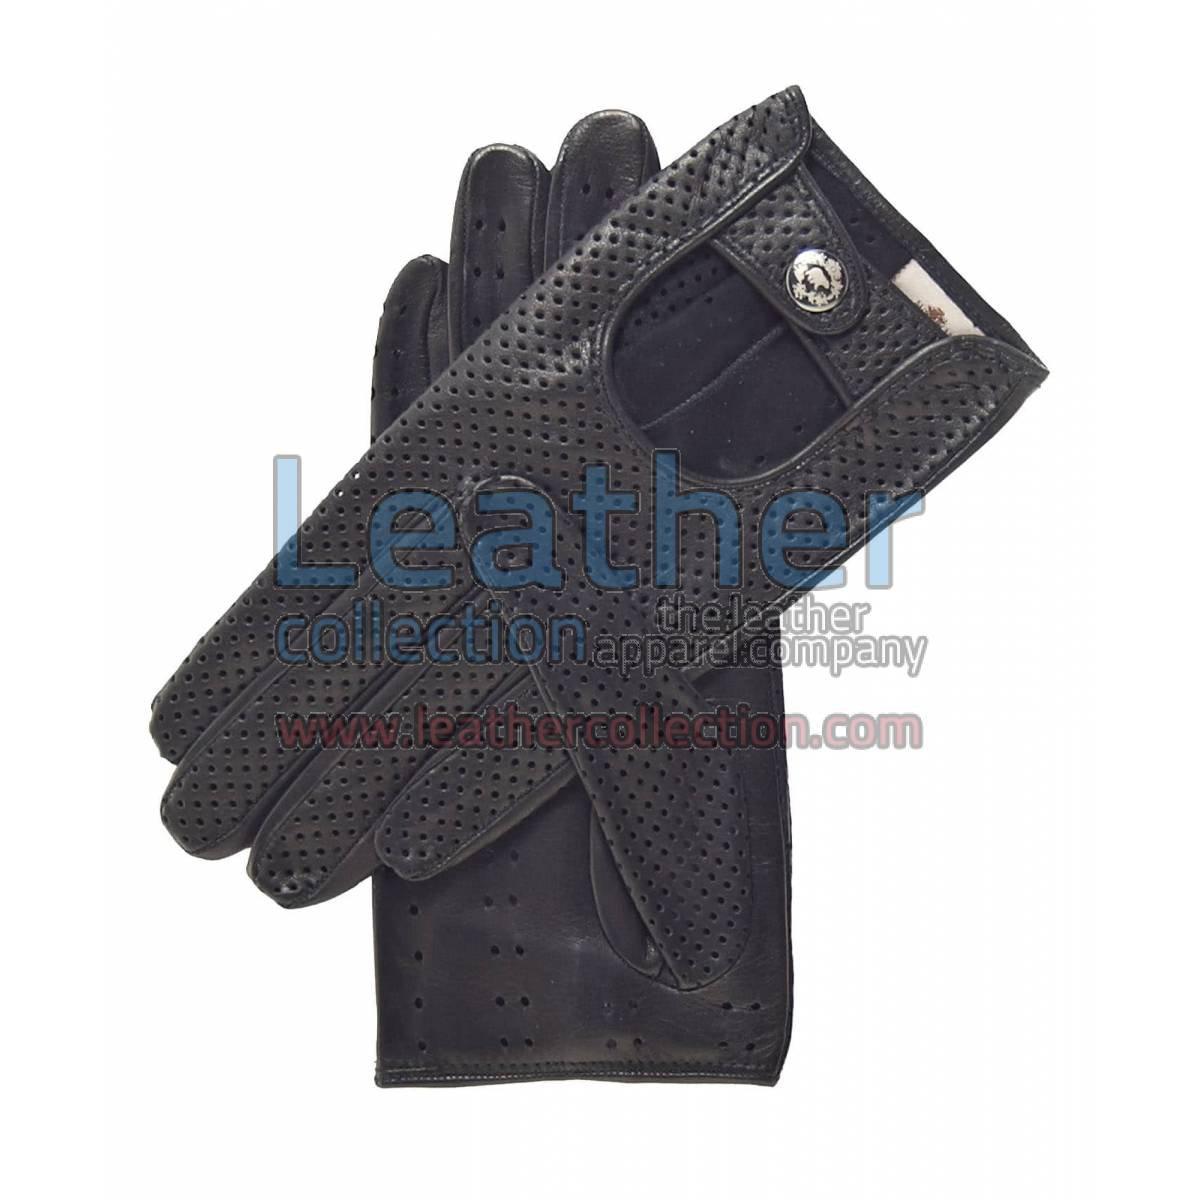 Ladies Summer Ventilated Black Driving Gloves